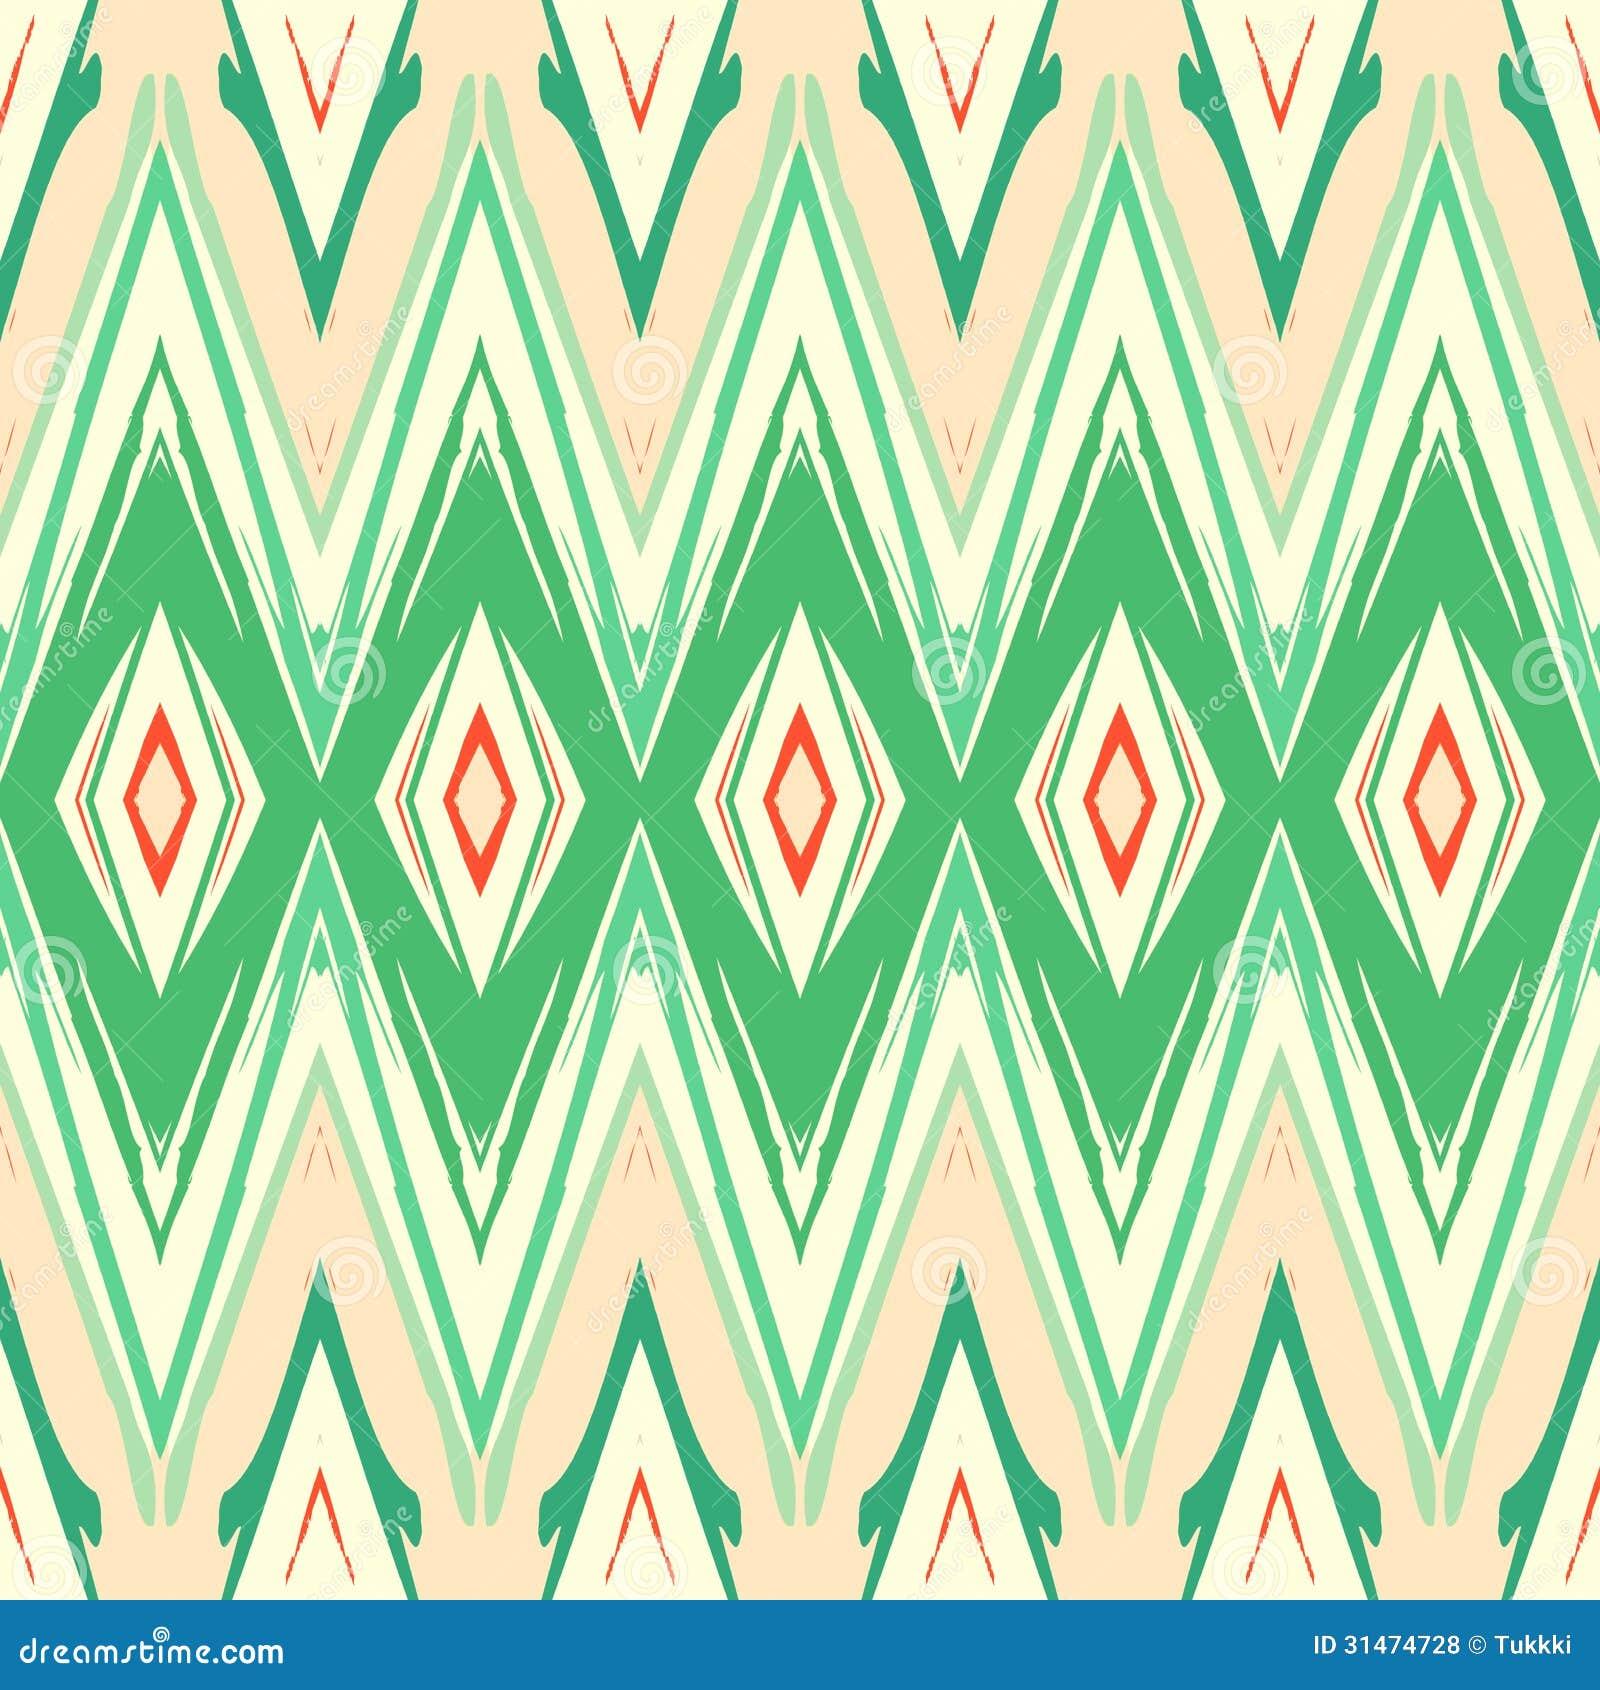 50 Modern Wallpaper Pattern: Ikat Pattern Stock Vector. Image Of Ethnic, Geometric